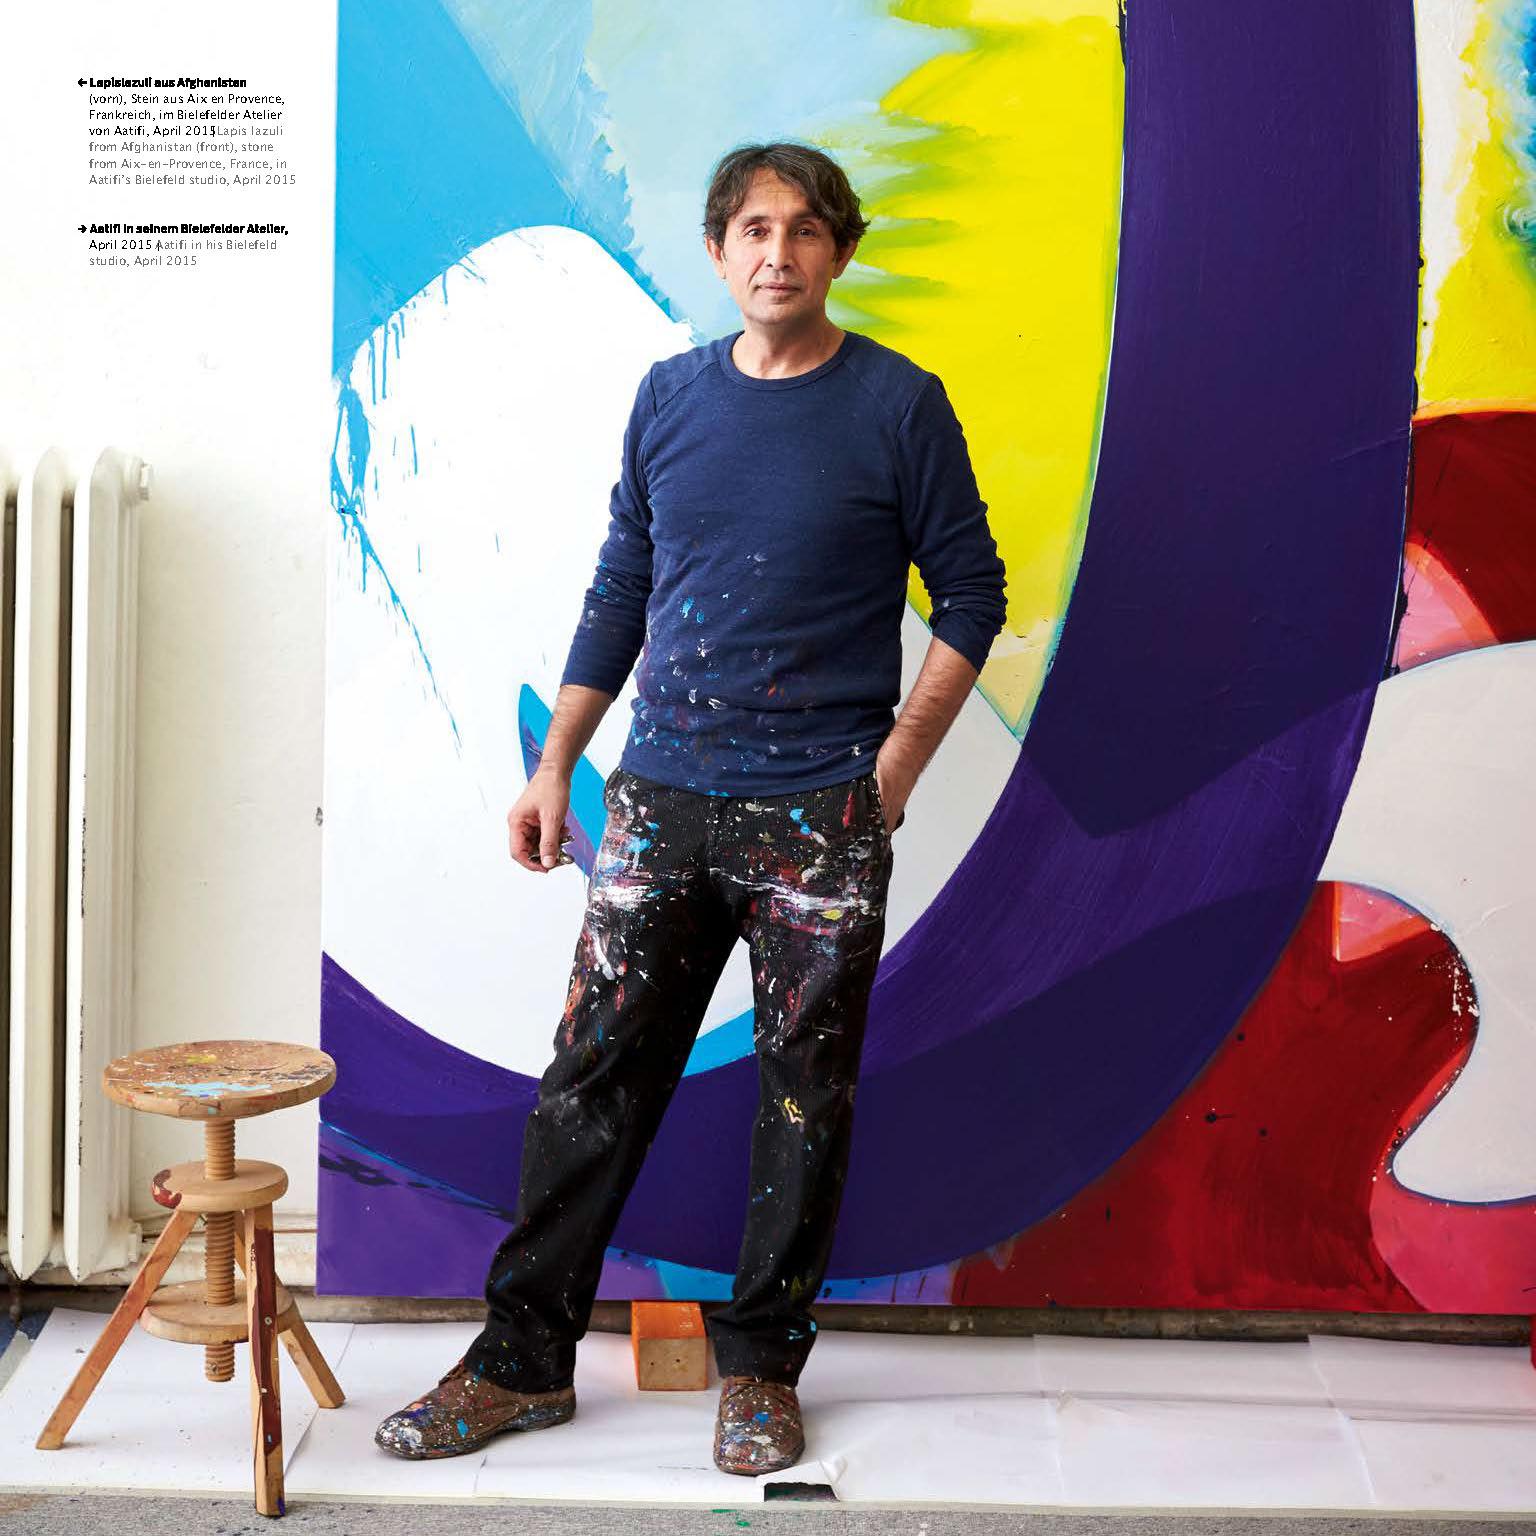 Kunstkatalog - Der Maler Aatifi in seinem Atelier